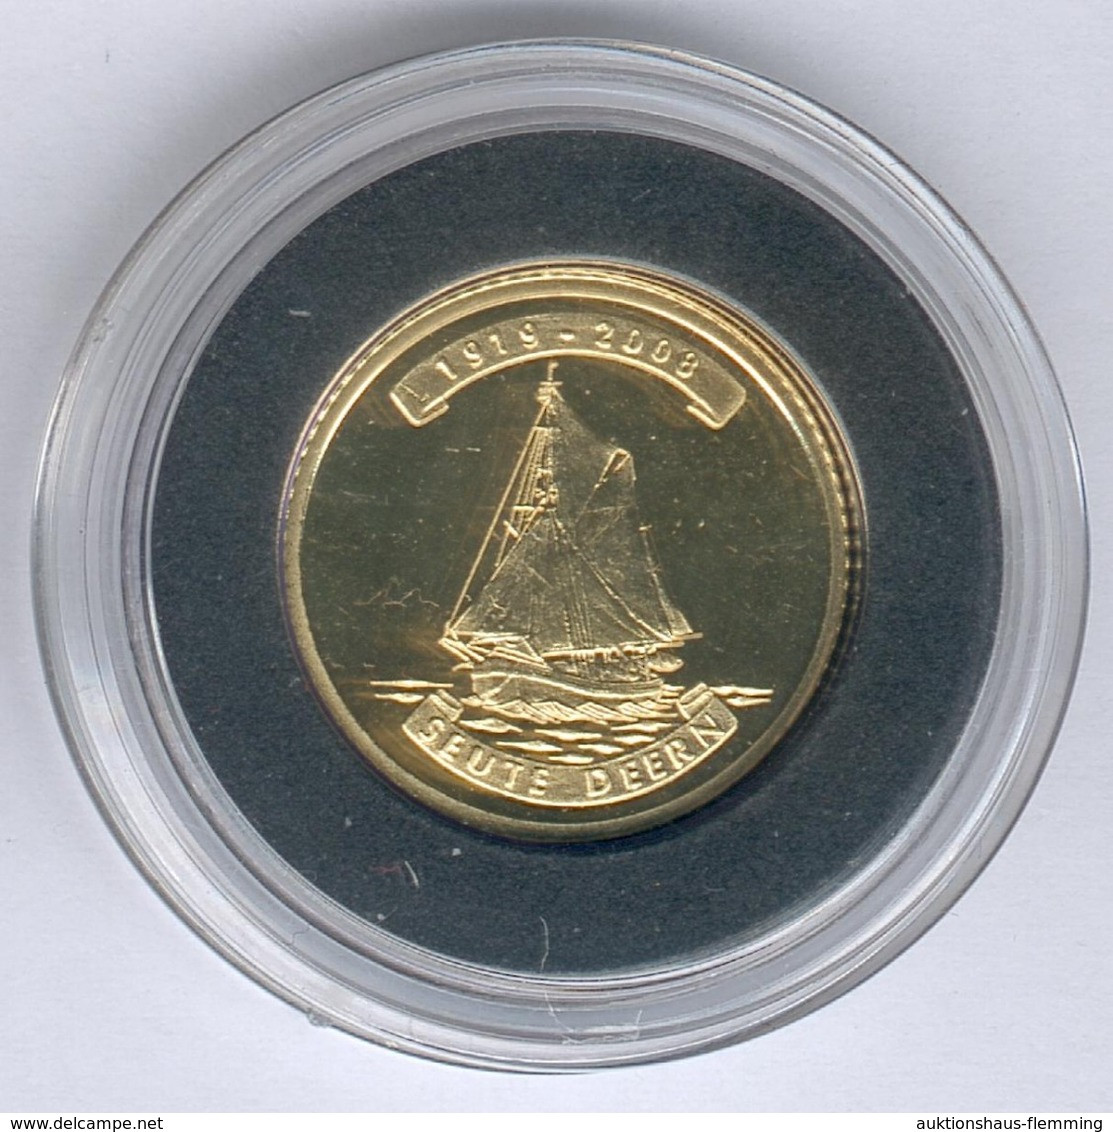 "Nordkorea 10 Won 2008 Segelschiff ""SEUTE DEERN"" - 1g 917er Gold, Durchmesser: 16mm, Mit Zertifikat, PP- - Korea, North"